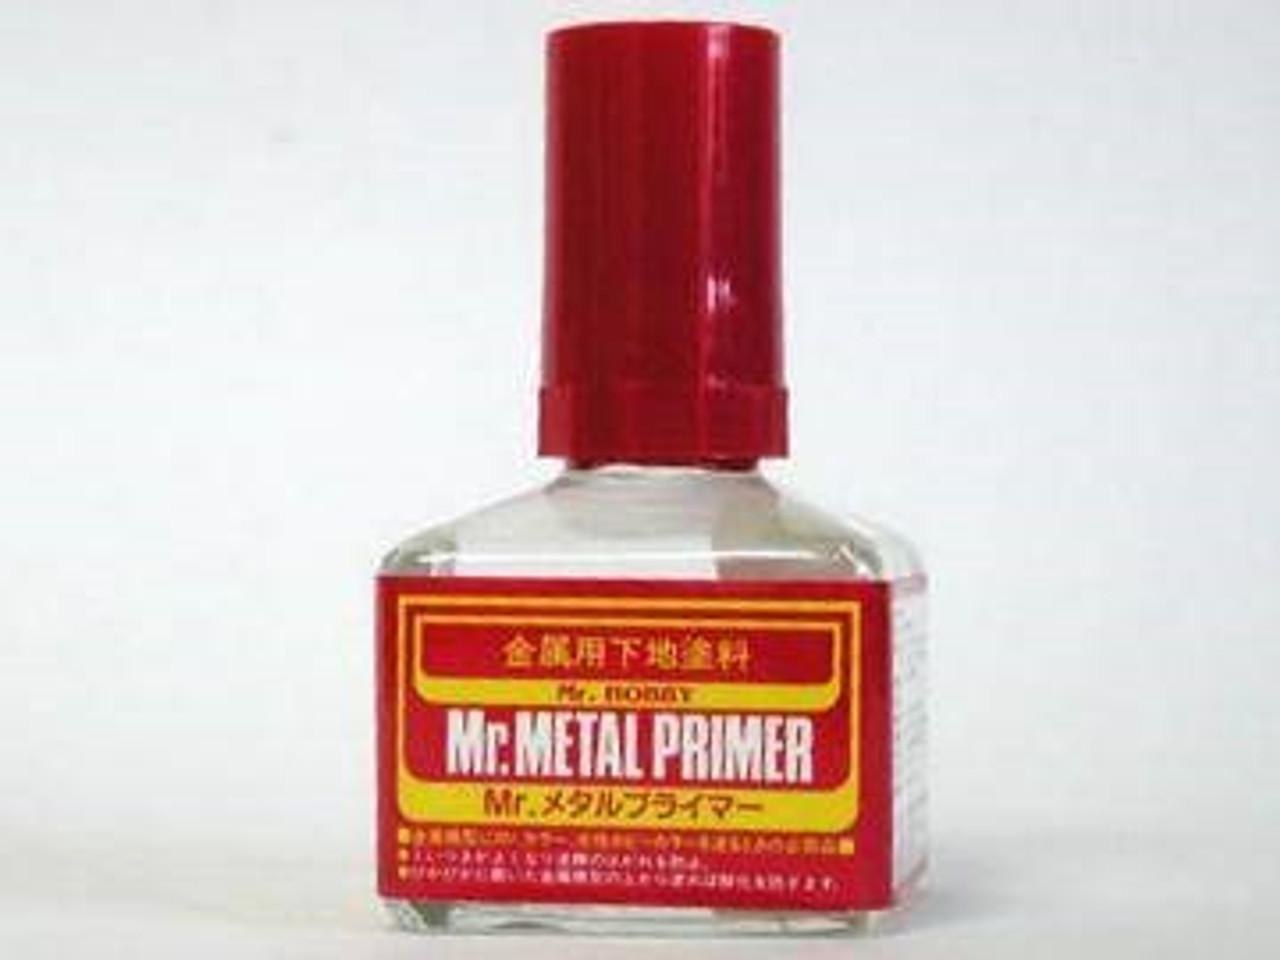 Mr. Metal Primer 40ml Bottle